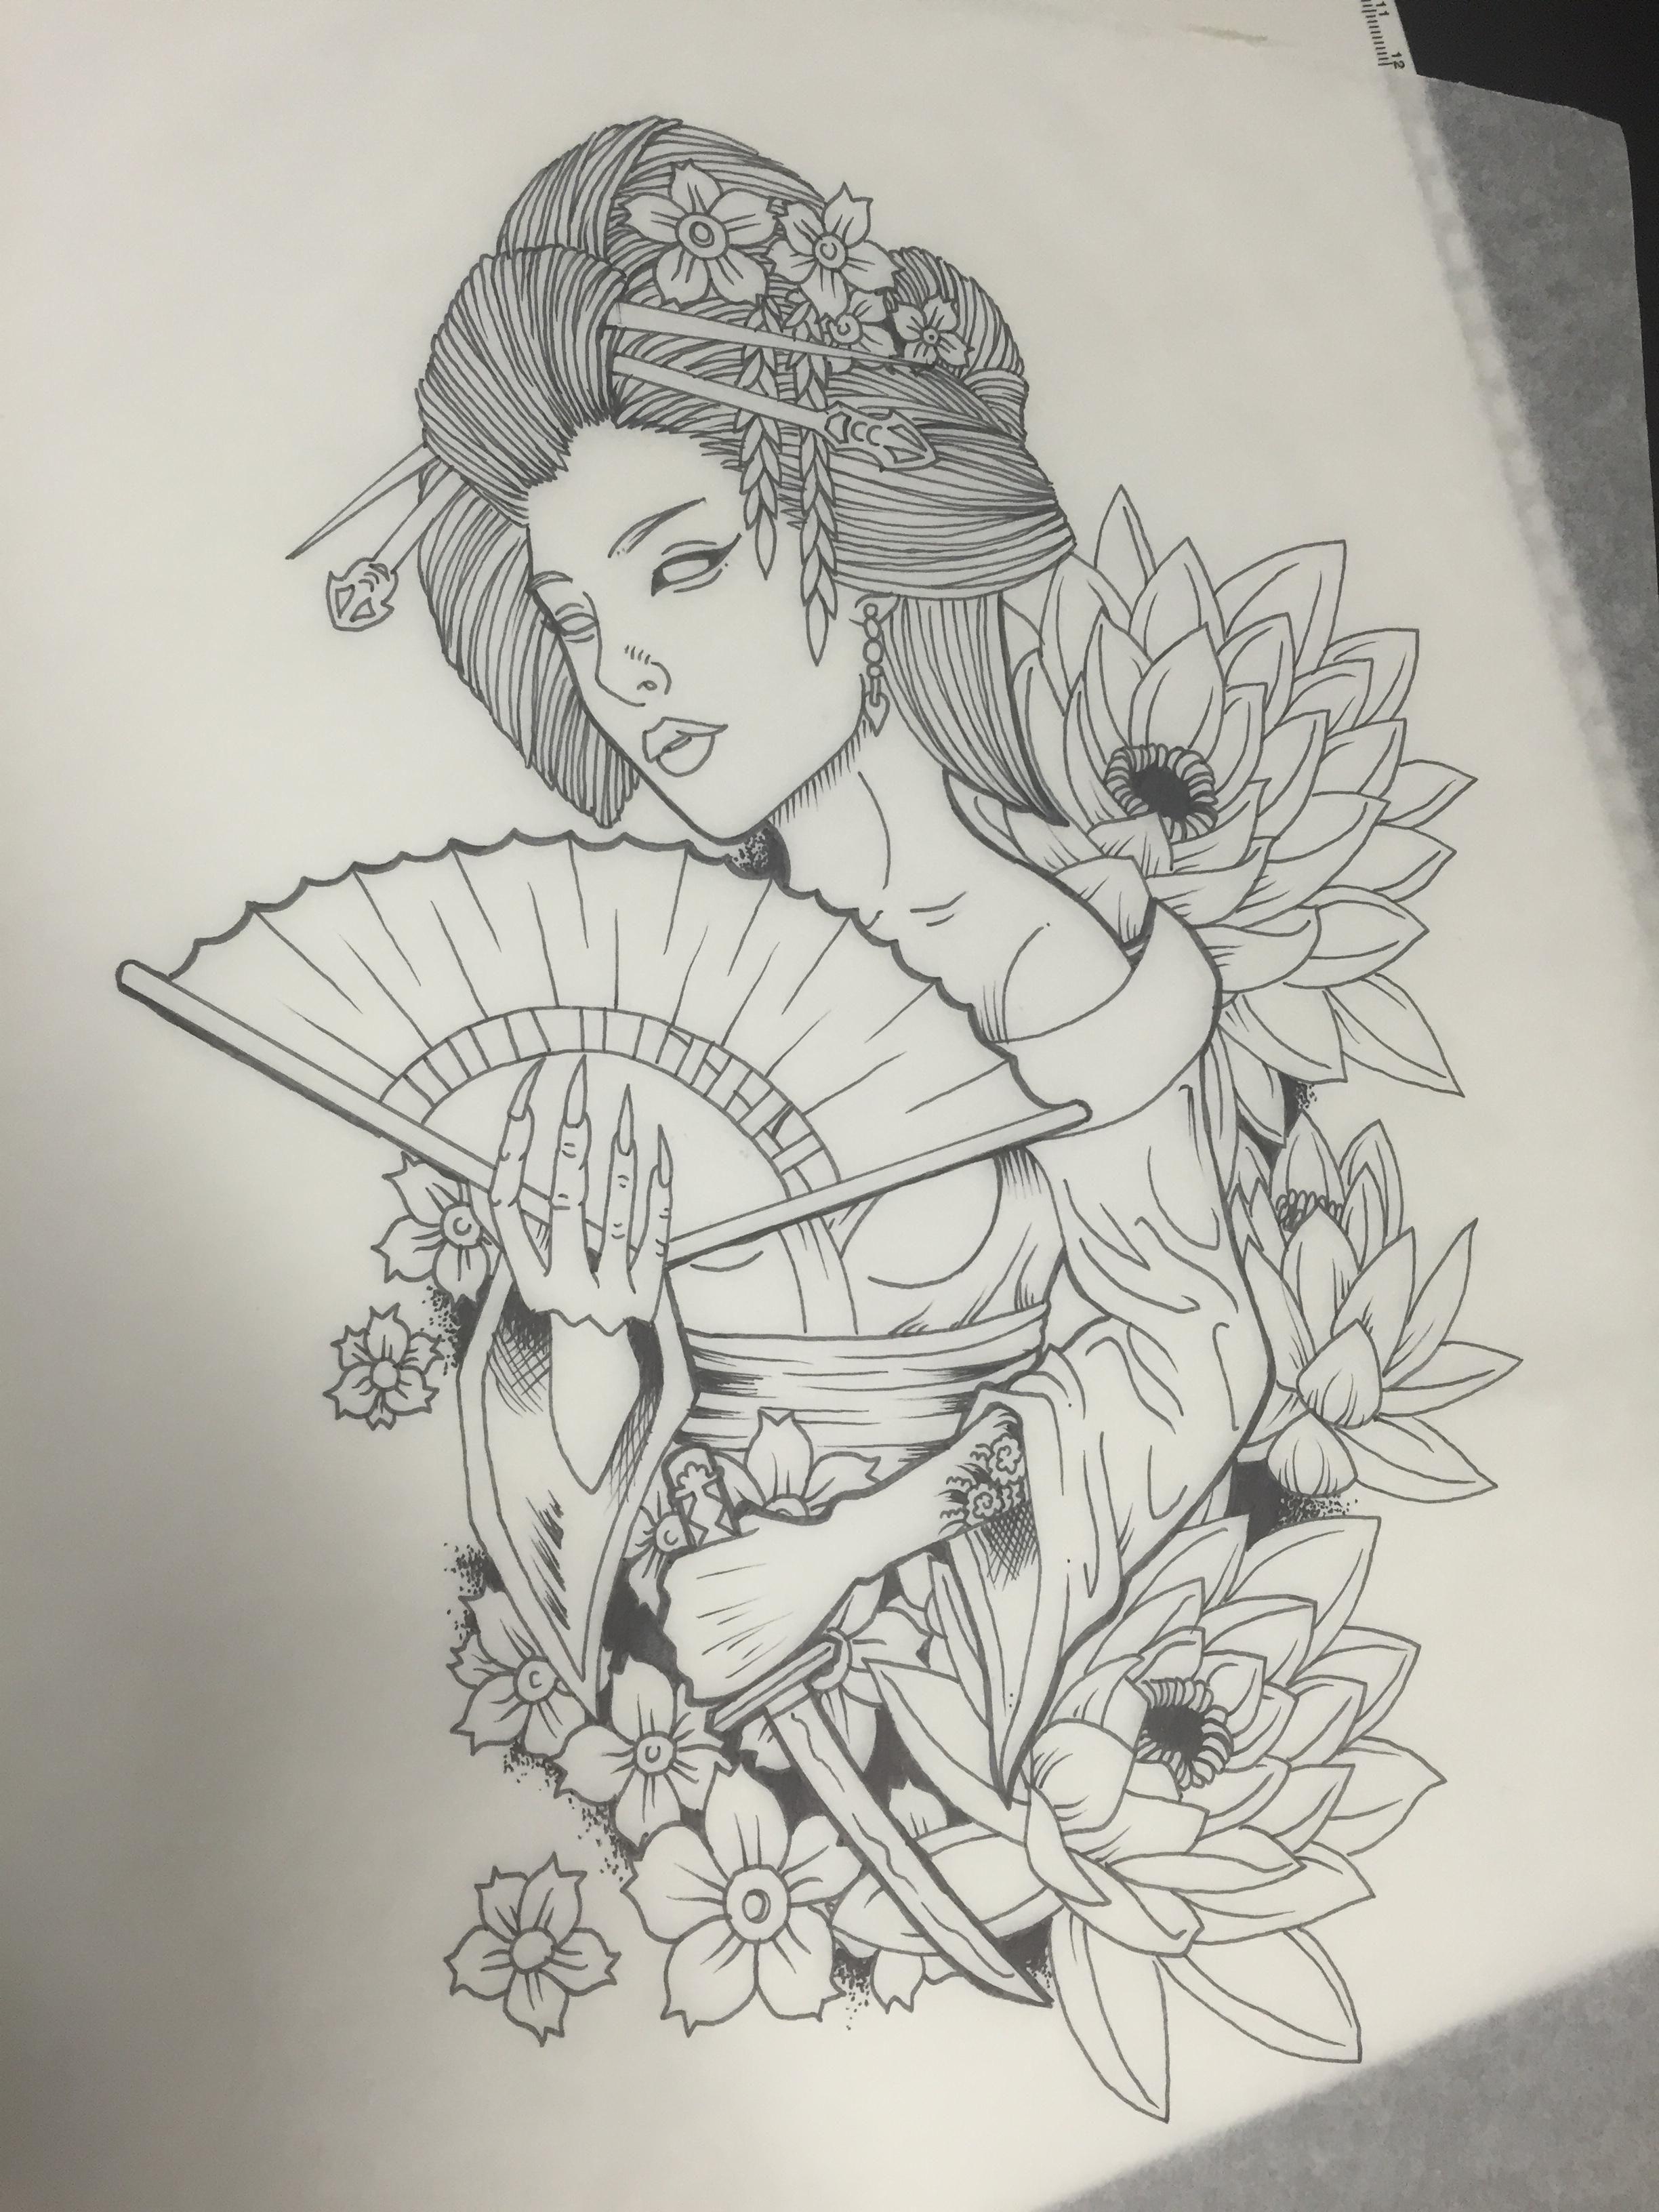 Pin De Gaabi Bizzi Em Futuras Desenho De Tatuagem De Gueixa